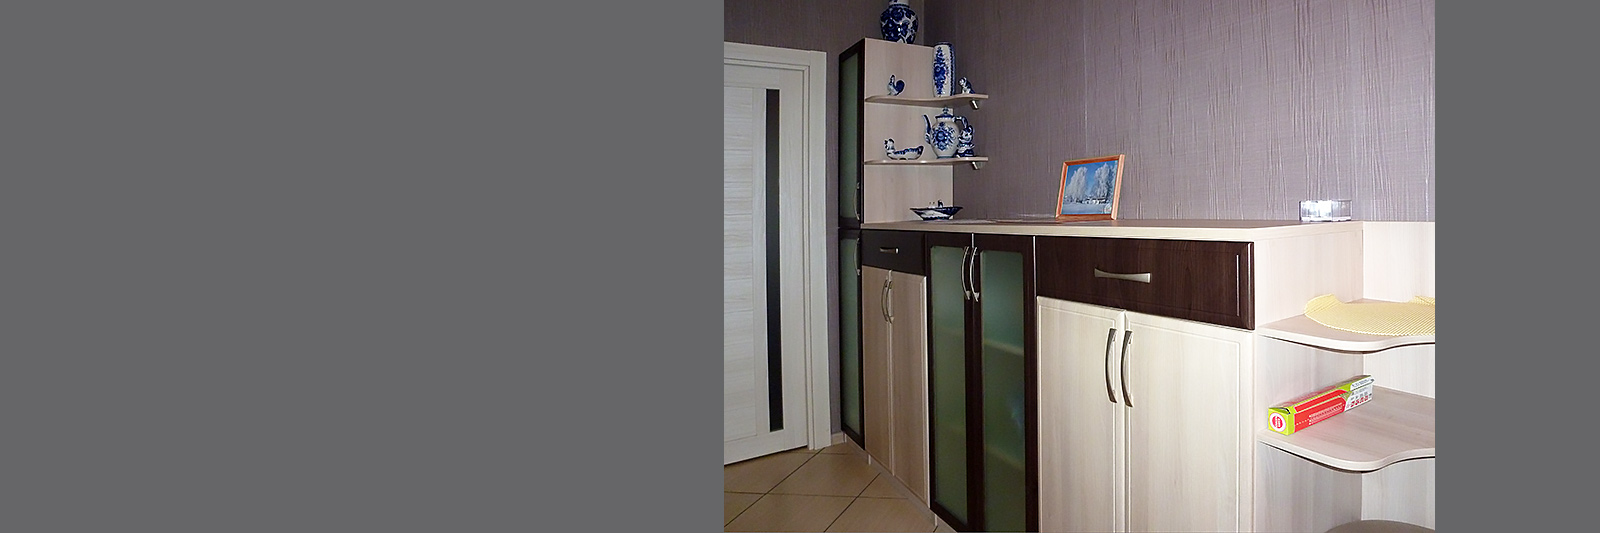 Комплект тумб со шкафом по индивидуальному проекту